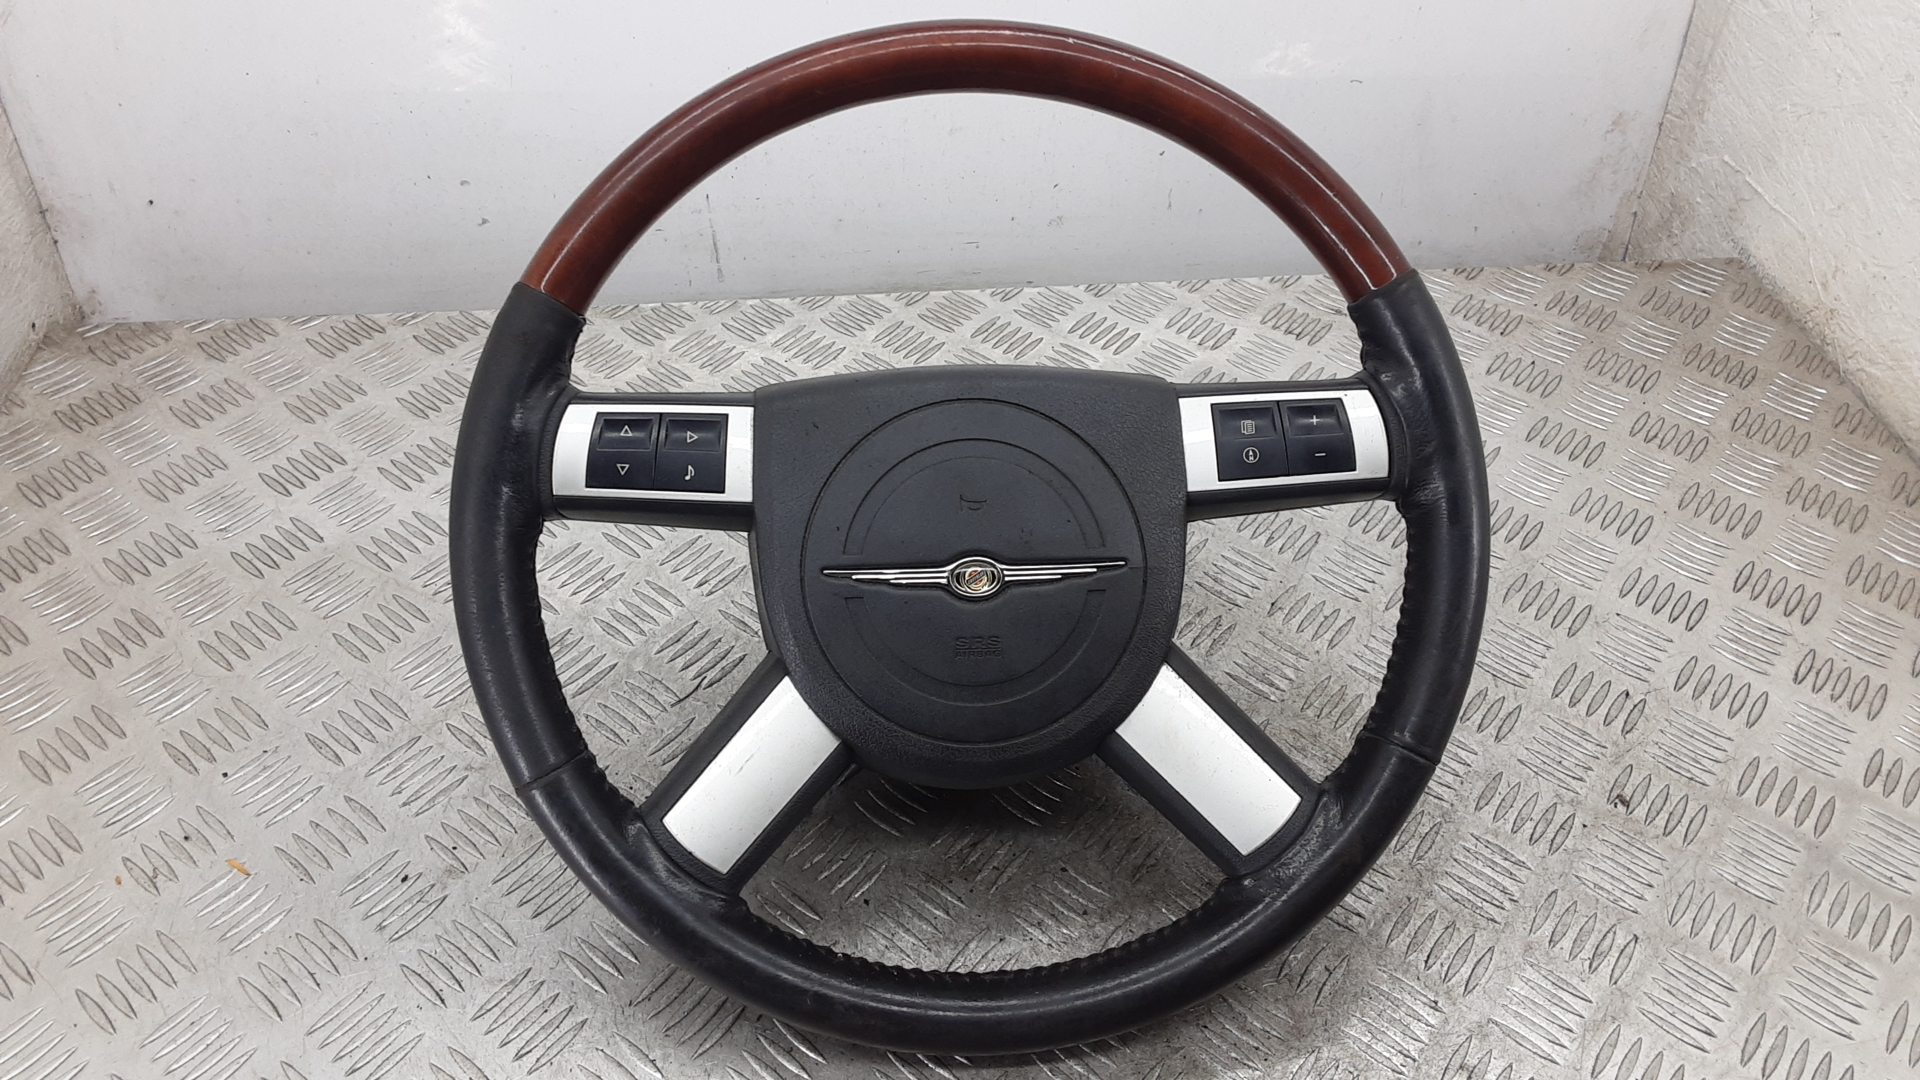 Рулевое колесо, CHRYSLER, 300C 1, 2007